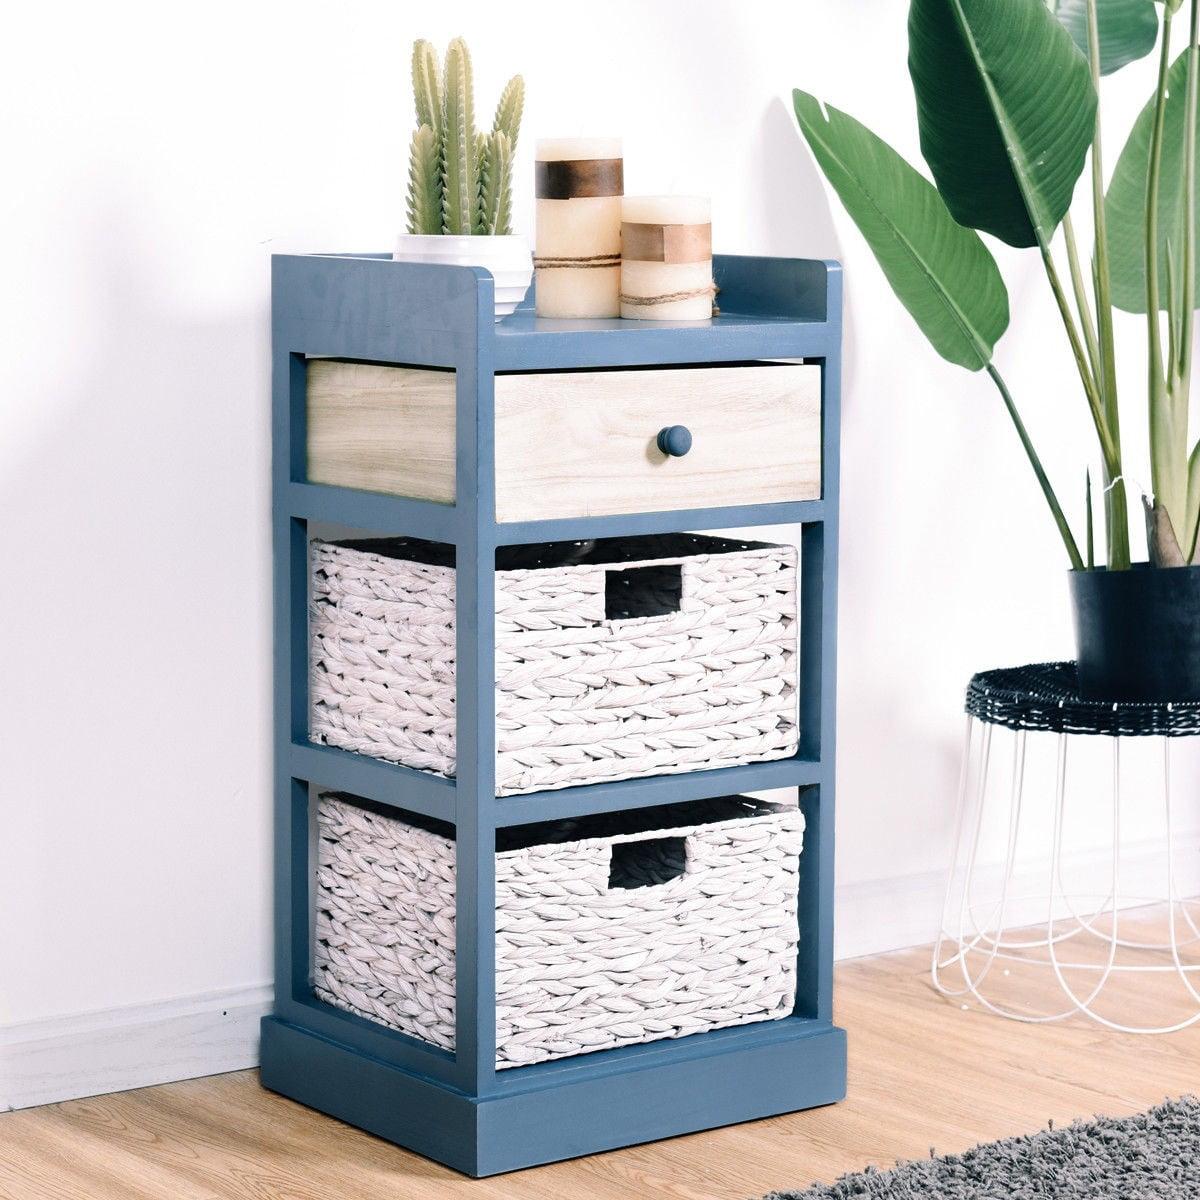 Apontus Stylish Nightstand Storage Organizer w/ 1 Drawer and 2 Baskets